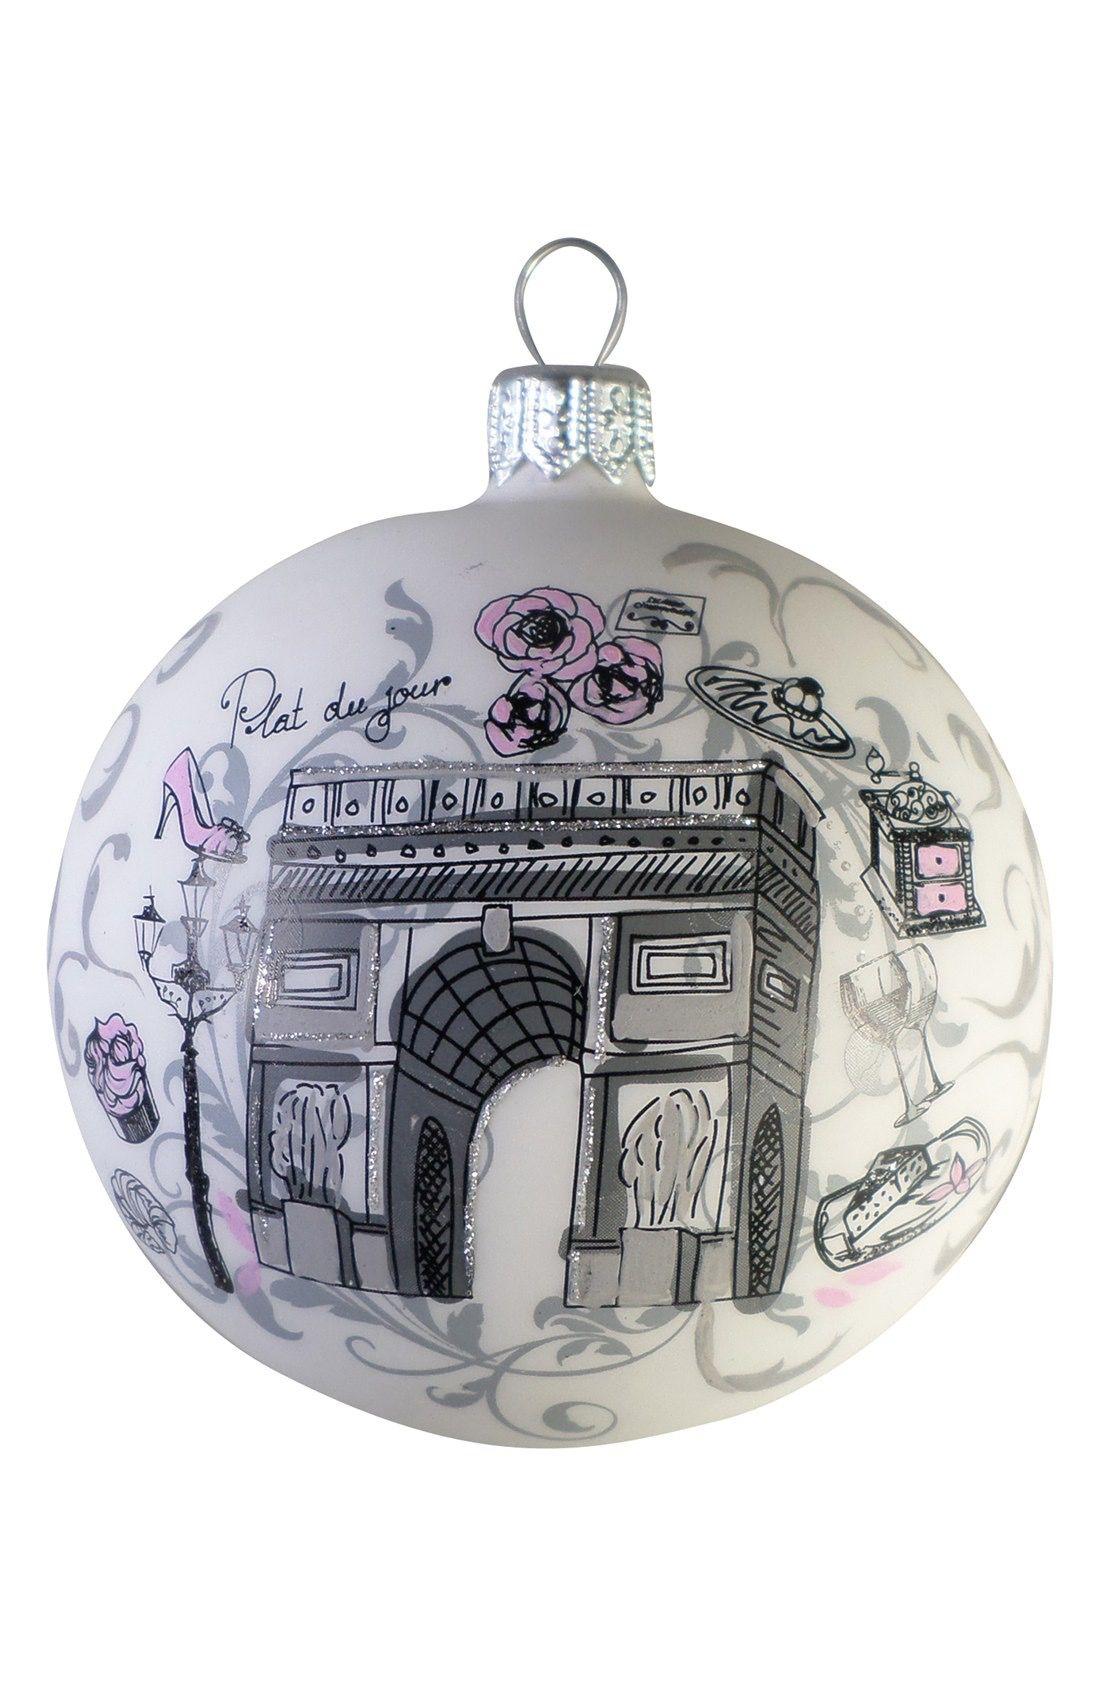 London UK Glass Ball Christmas Ornament 3.25 Inches Big Ben